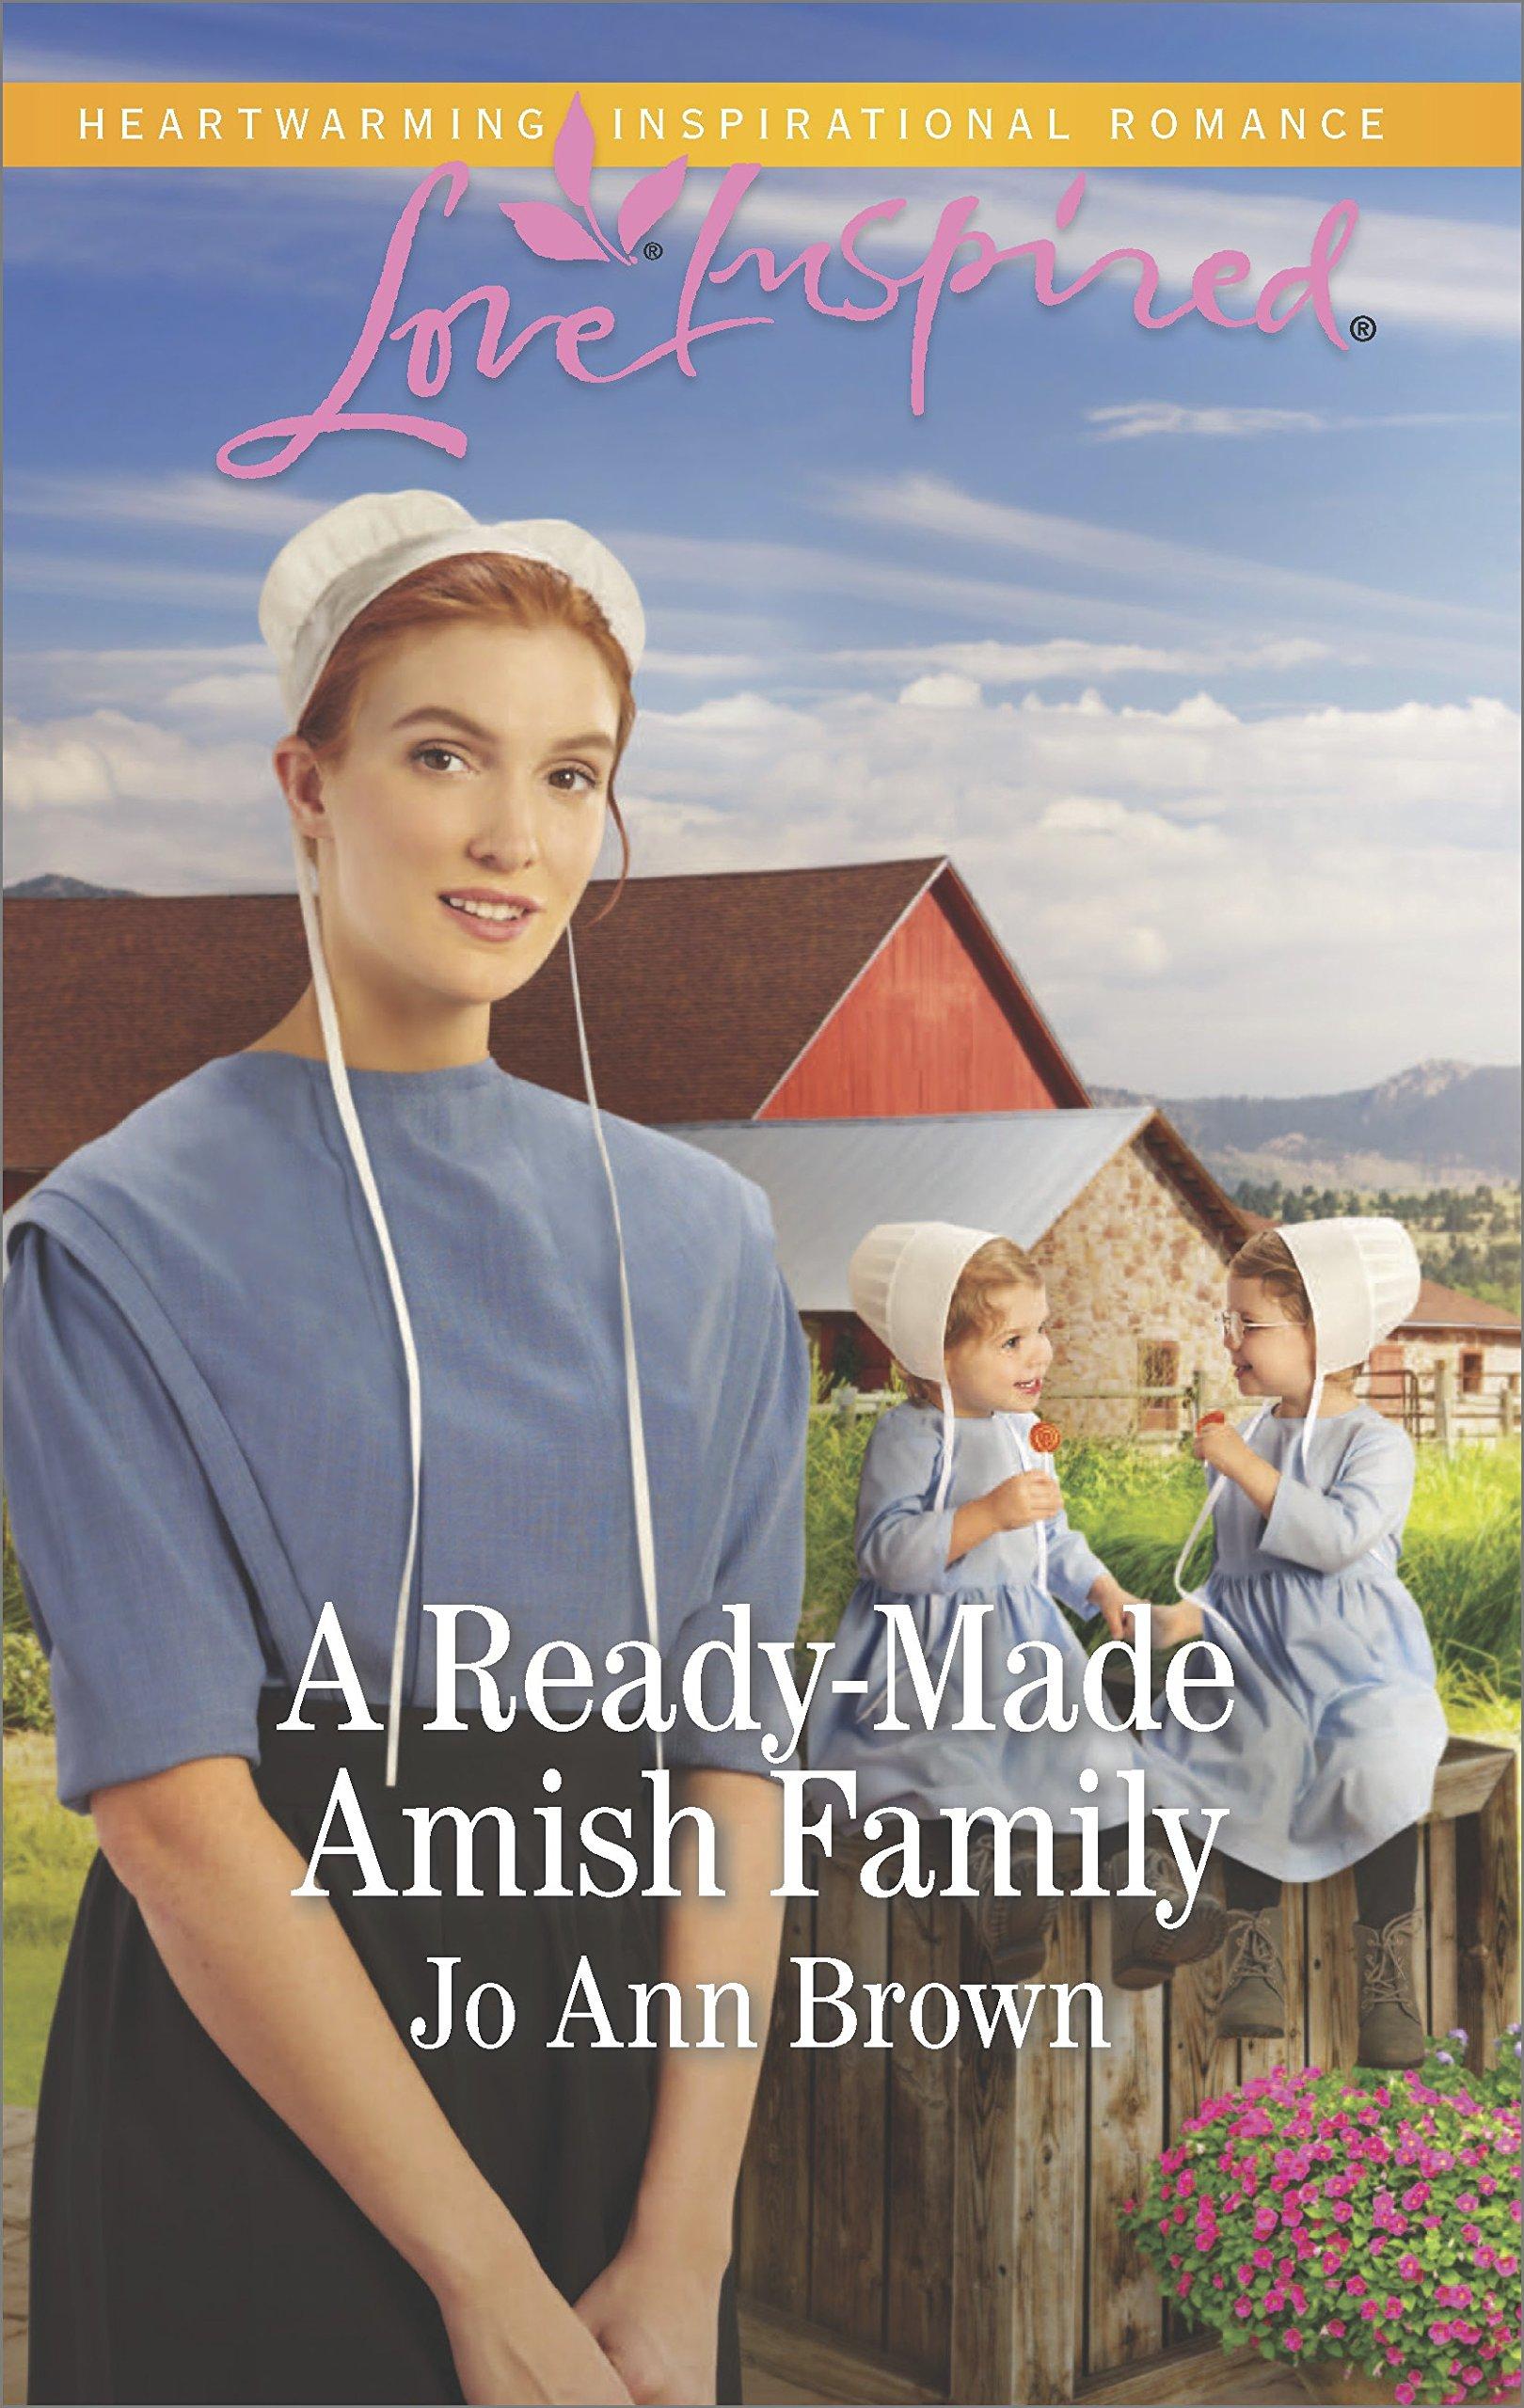 Ready Made Amish Family Hearts product image